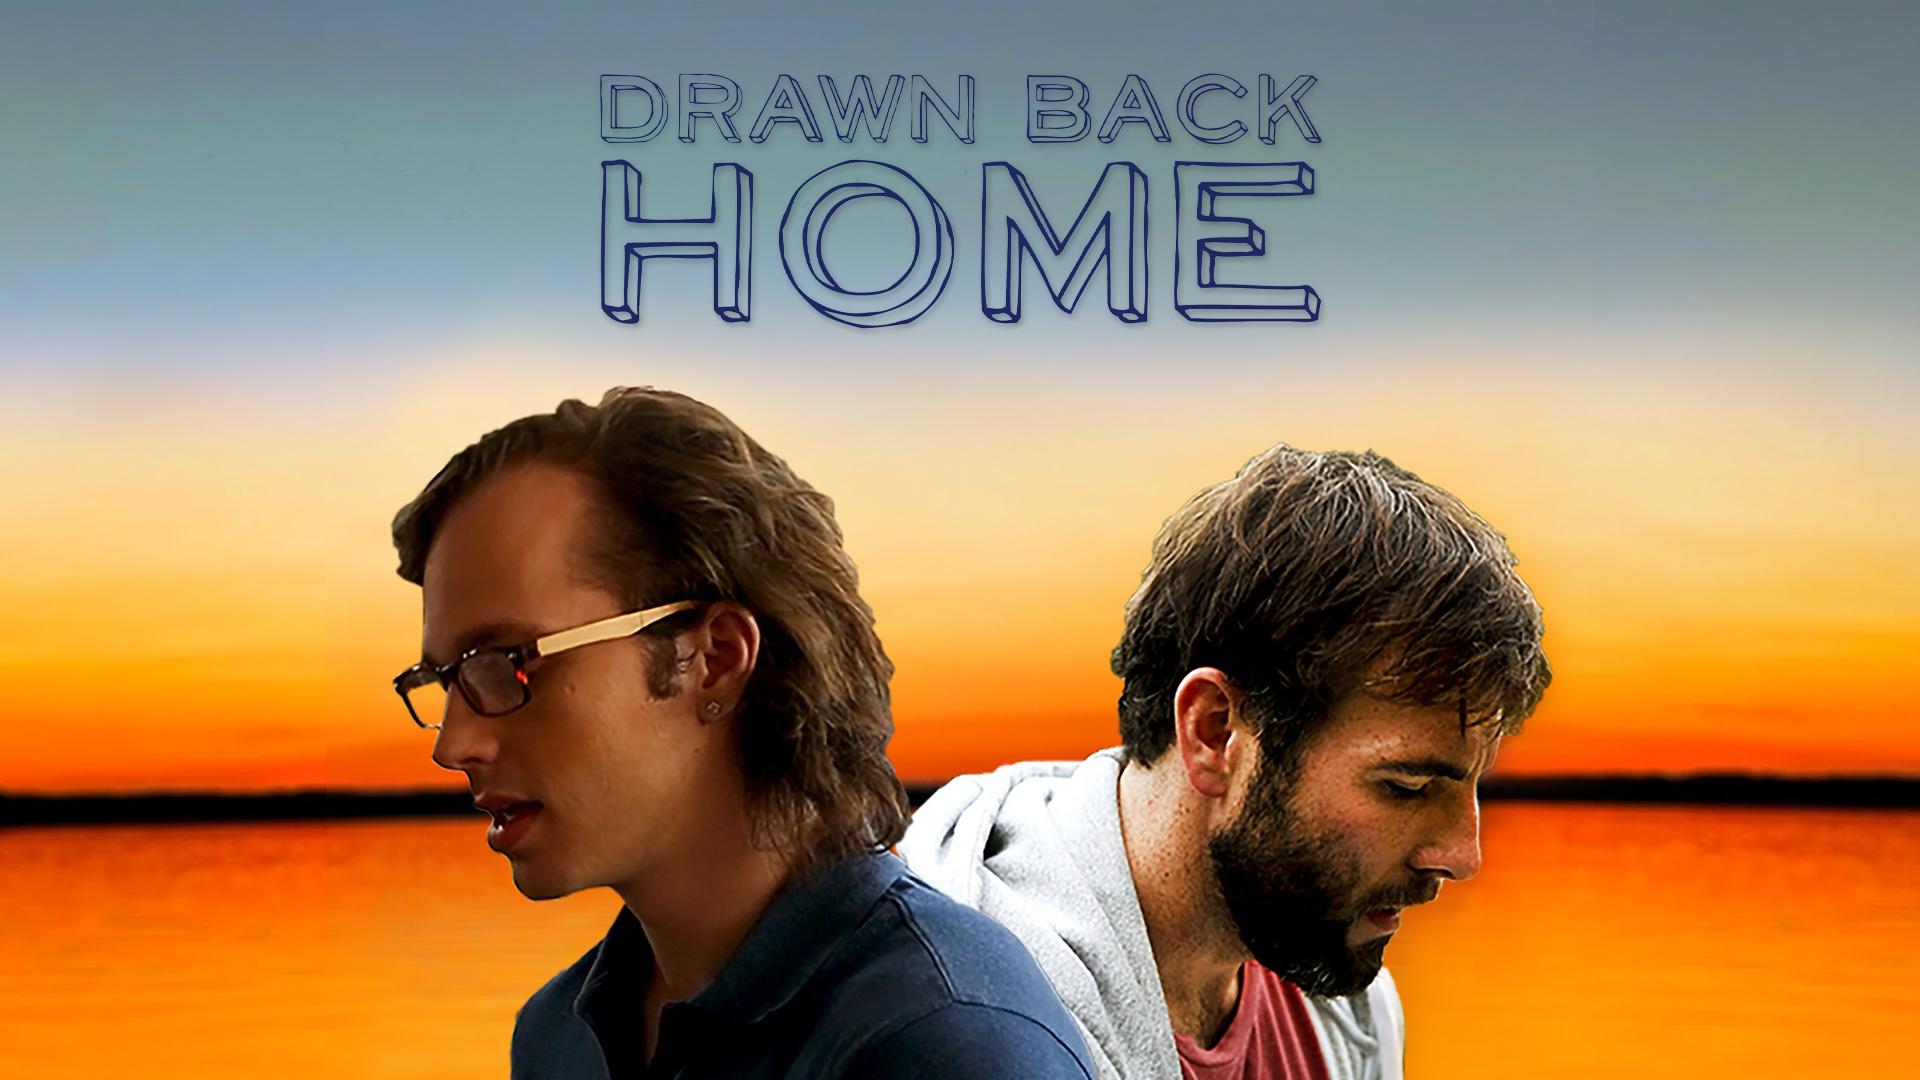 Drawn Back Home